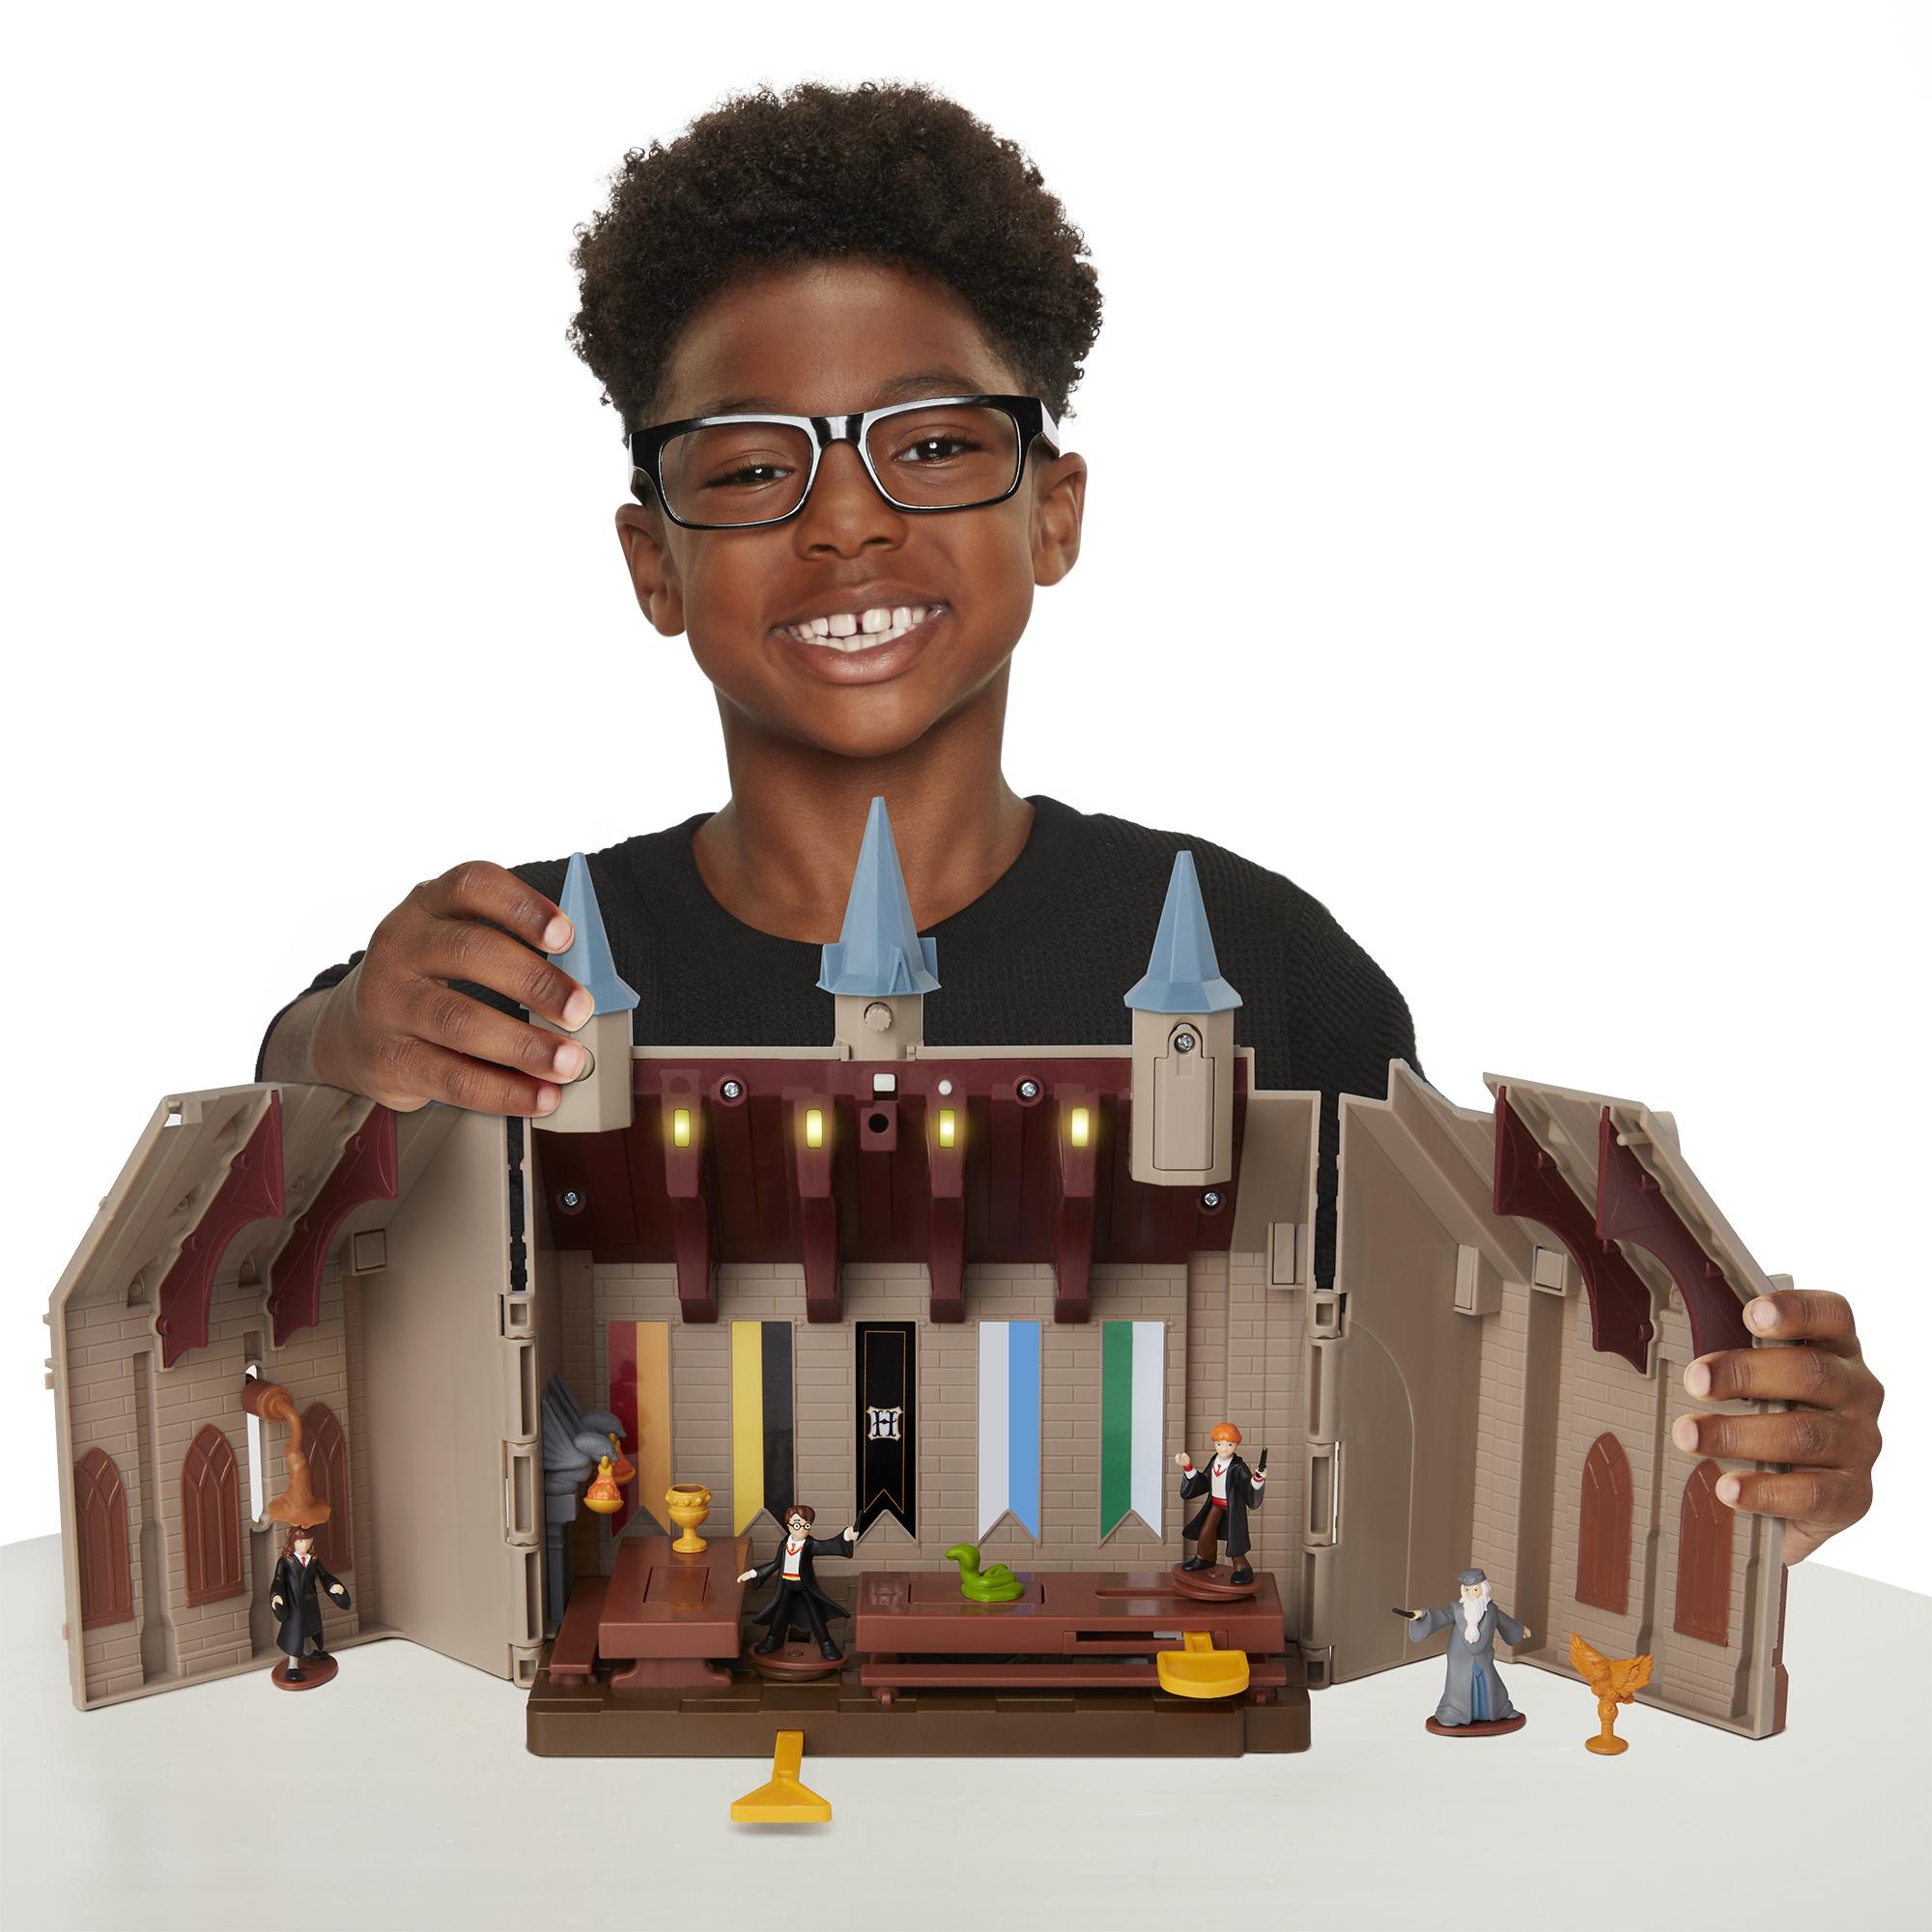 Harry Potter Hogwart's Great Hall Deluxe Mini Playset @Walmart $9.99